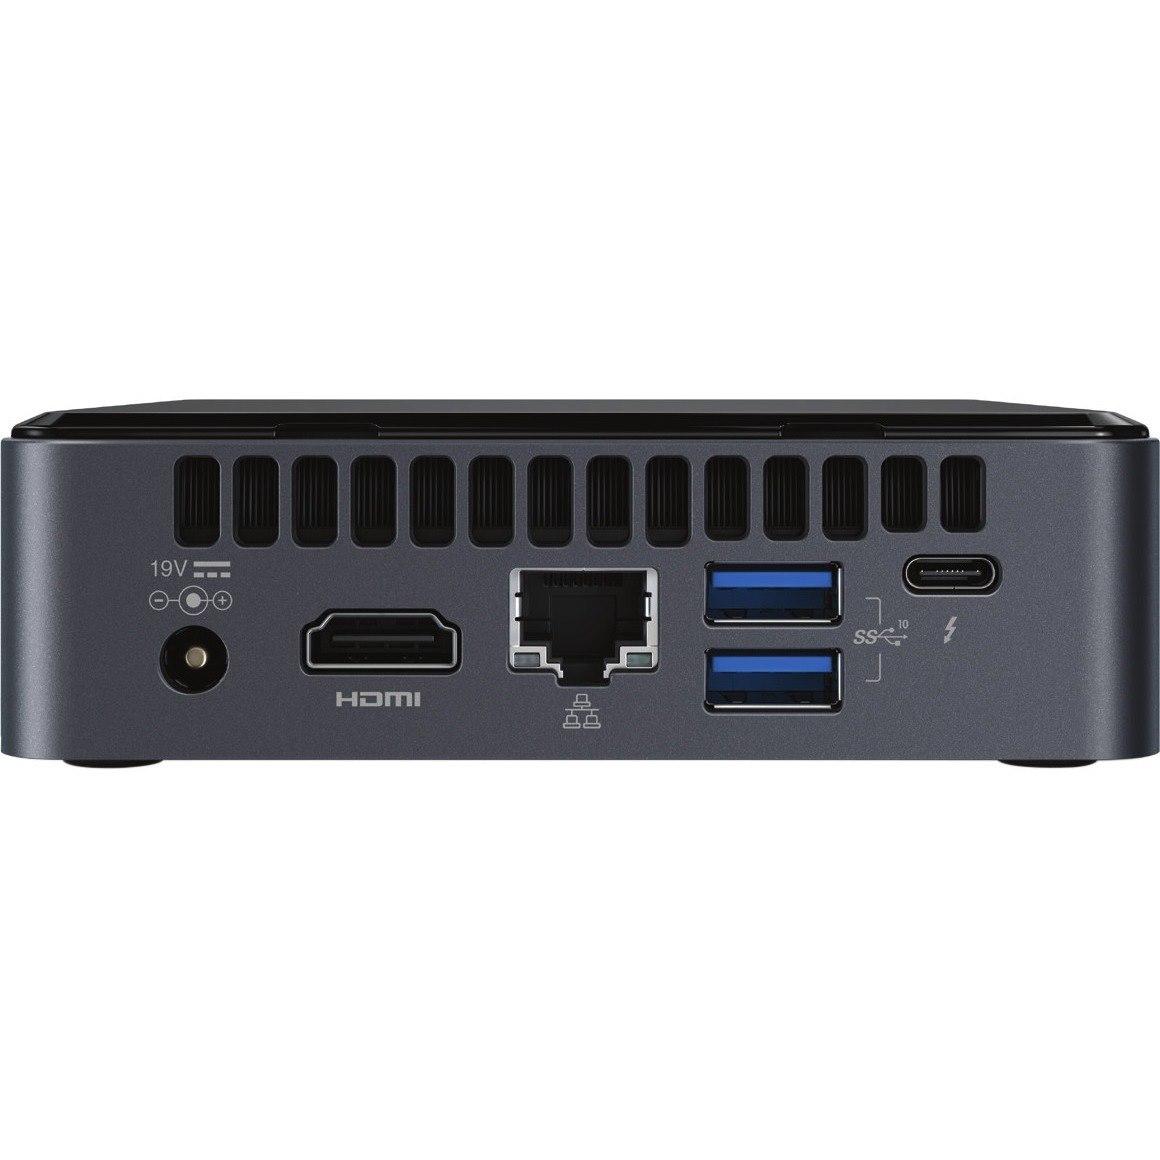 Intel NUC 8 Enthusiast NUC8i7BEKQA Desktop Computer - Core i7 i7-8559U - 16 GB RAM - 512 GB SSD - Mini PC